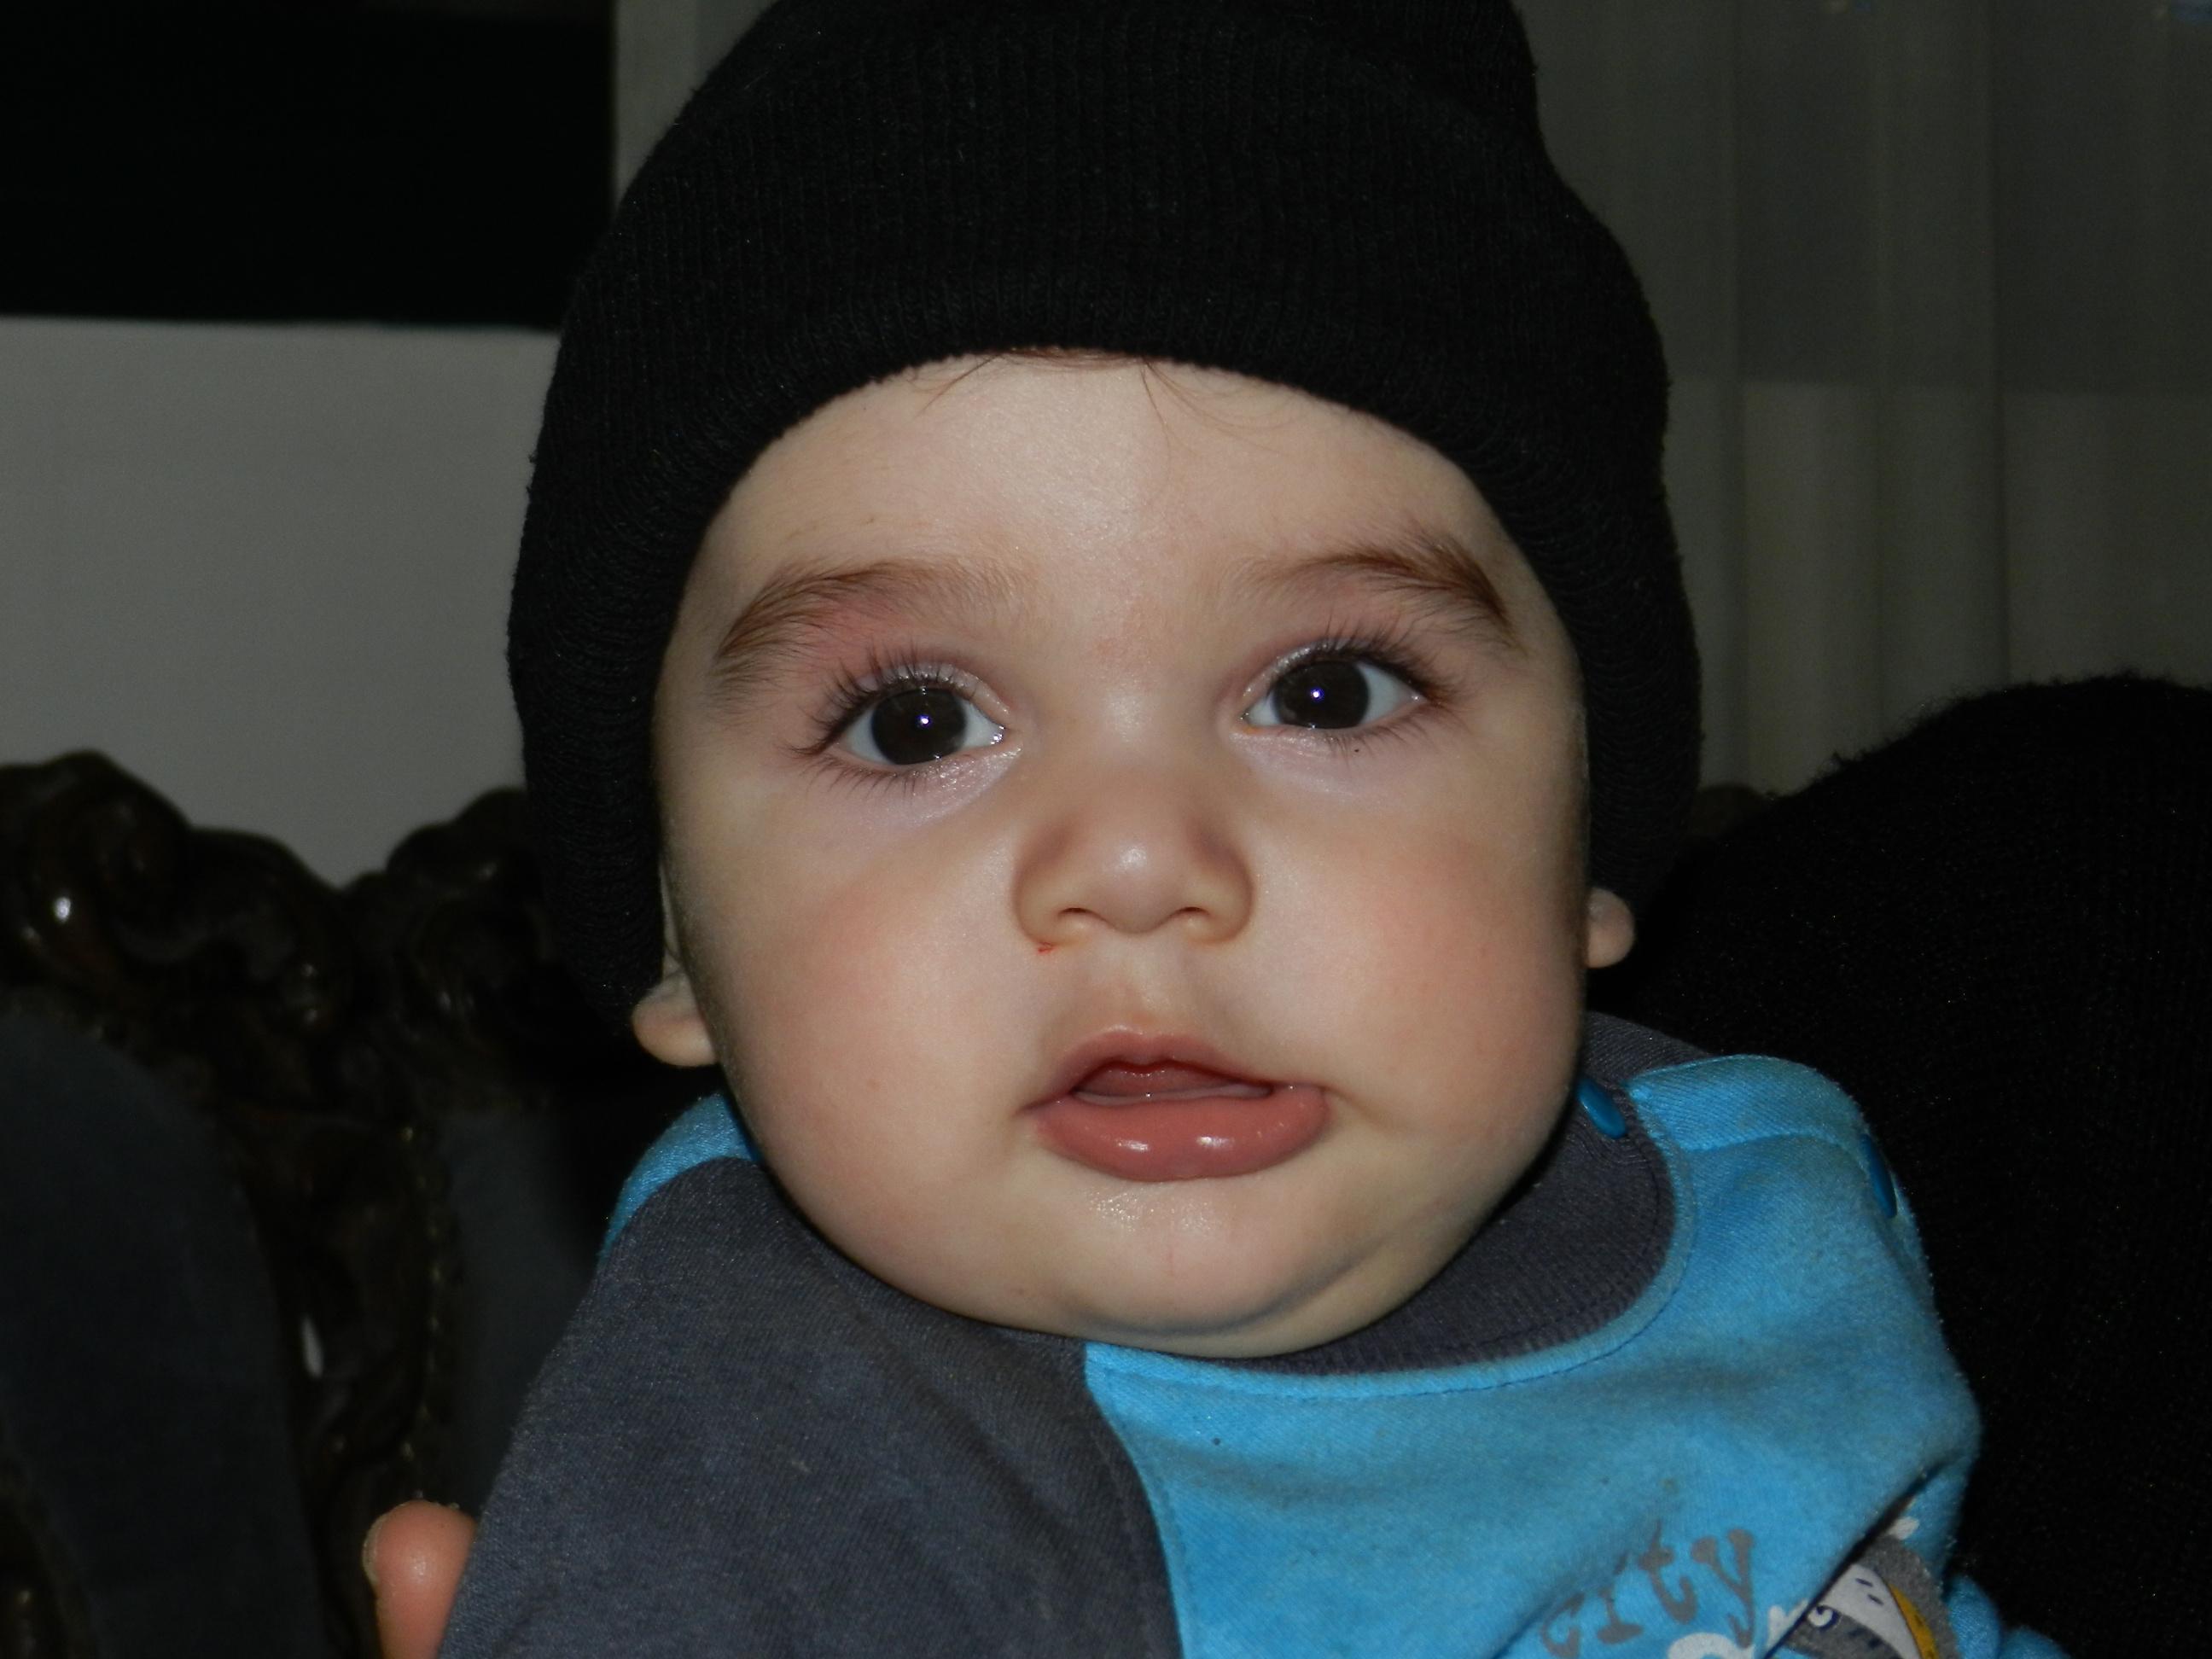 بالصور طفل صغير , اجمل صور الاطفال 1273 8